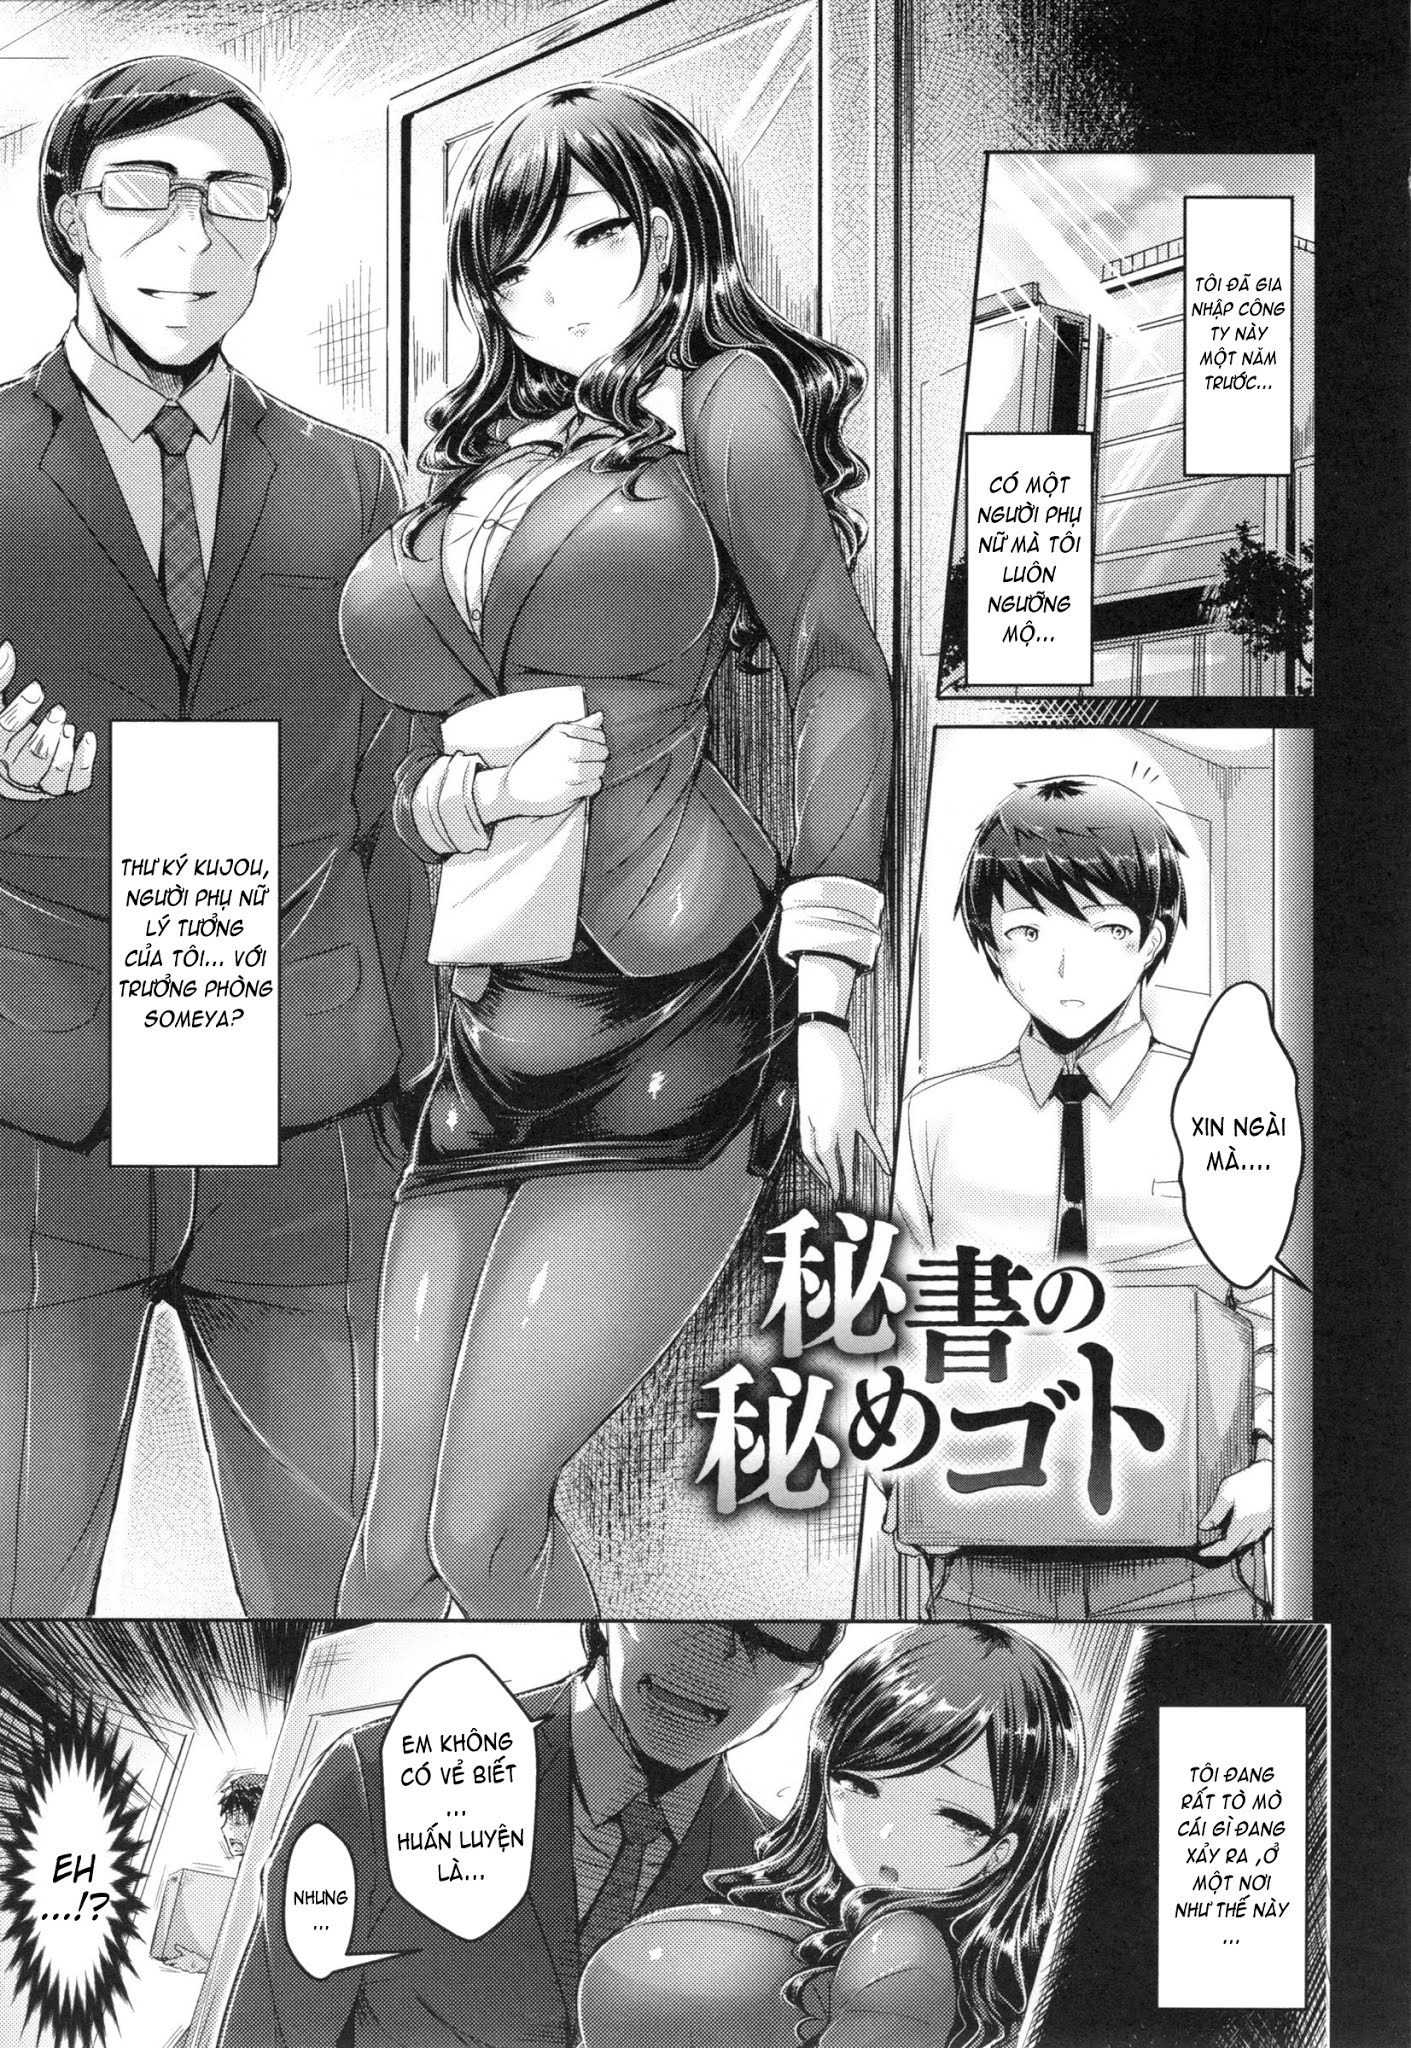 win-hentairules.net-194 Koizome Marking  - hentaicube.net - Truyện tranh hentai online